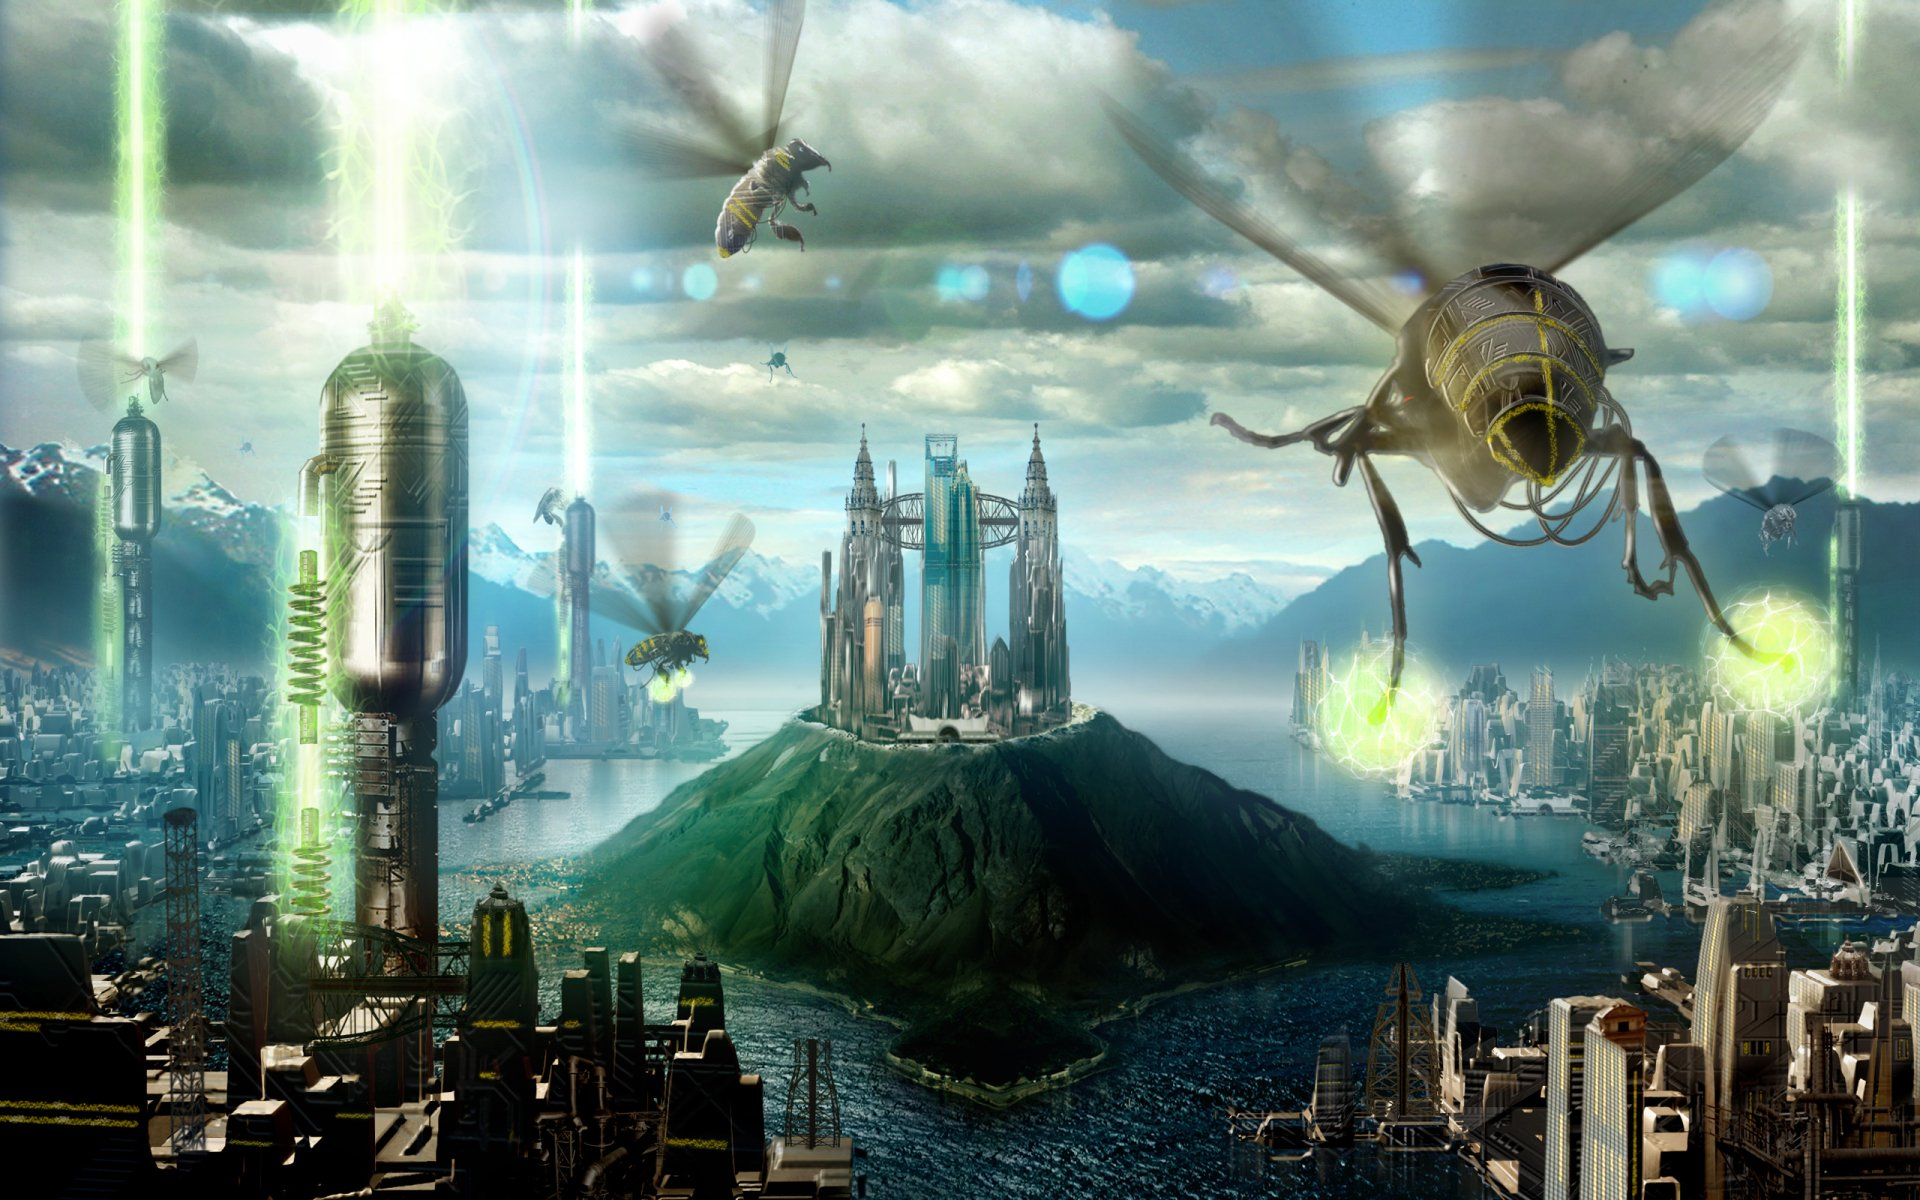 Sci Fi - City  Sci Fi Wallpaper